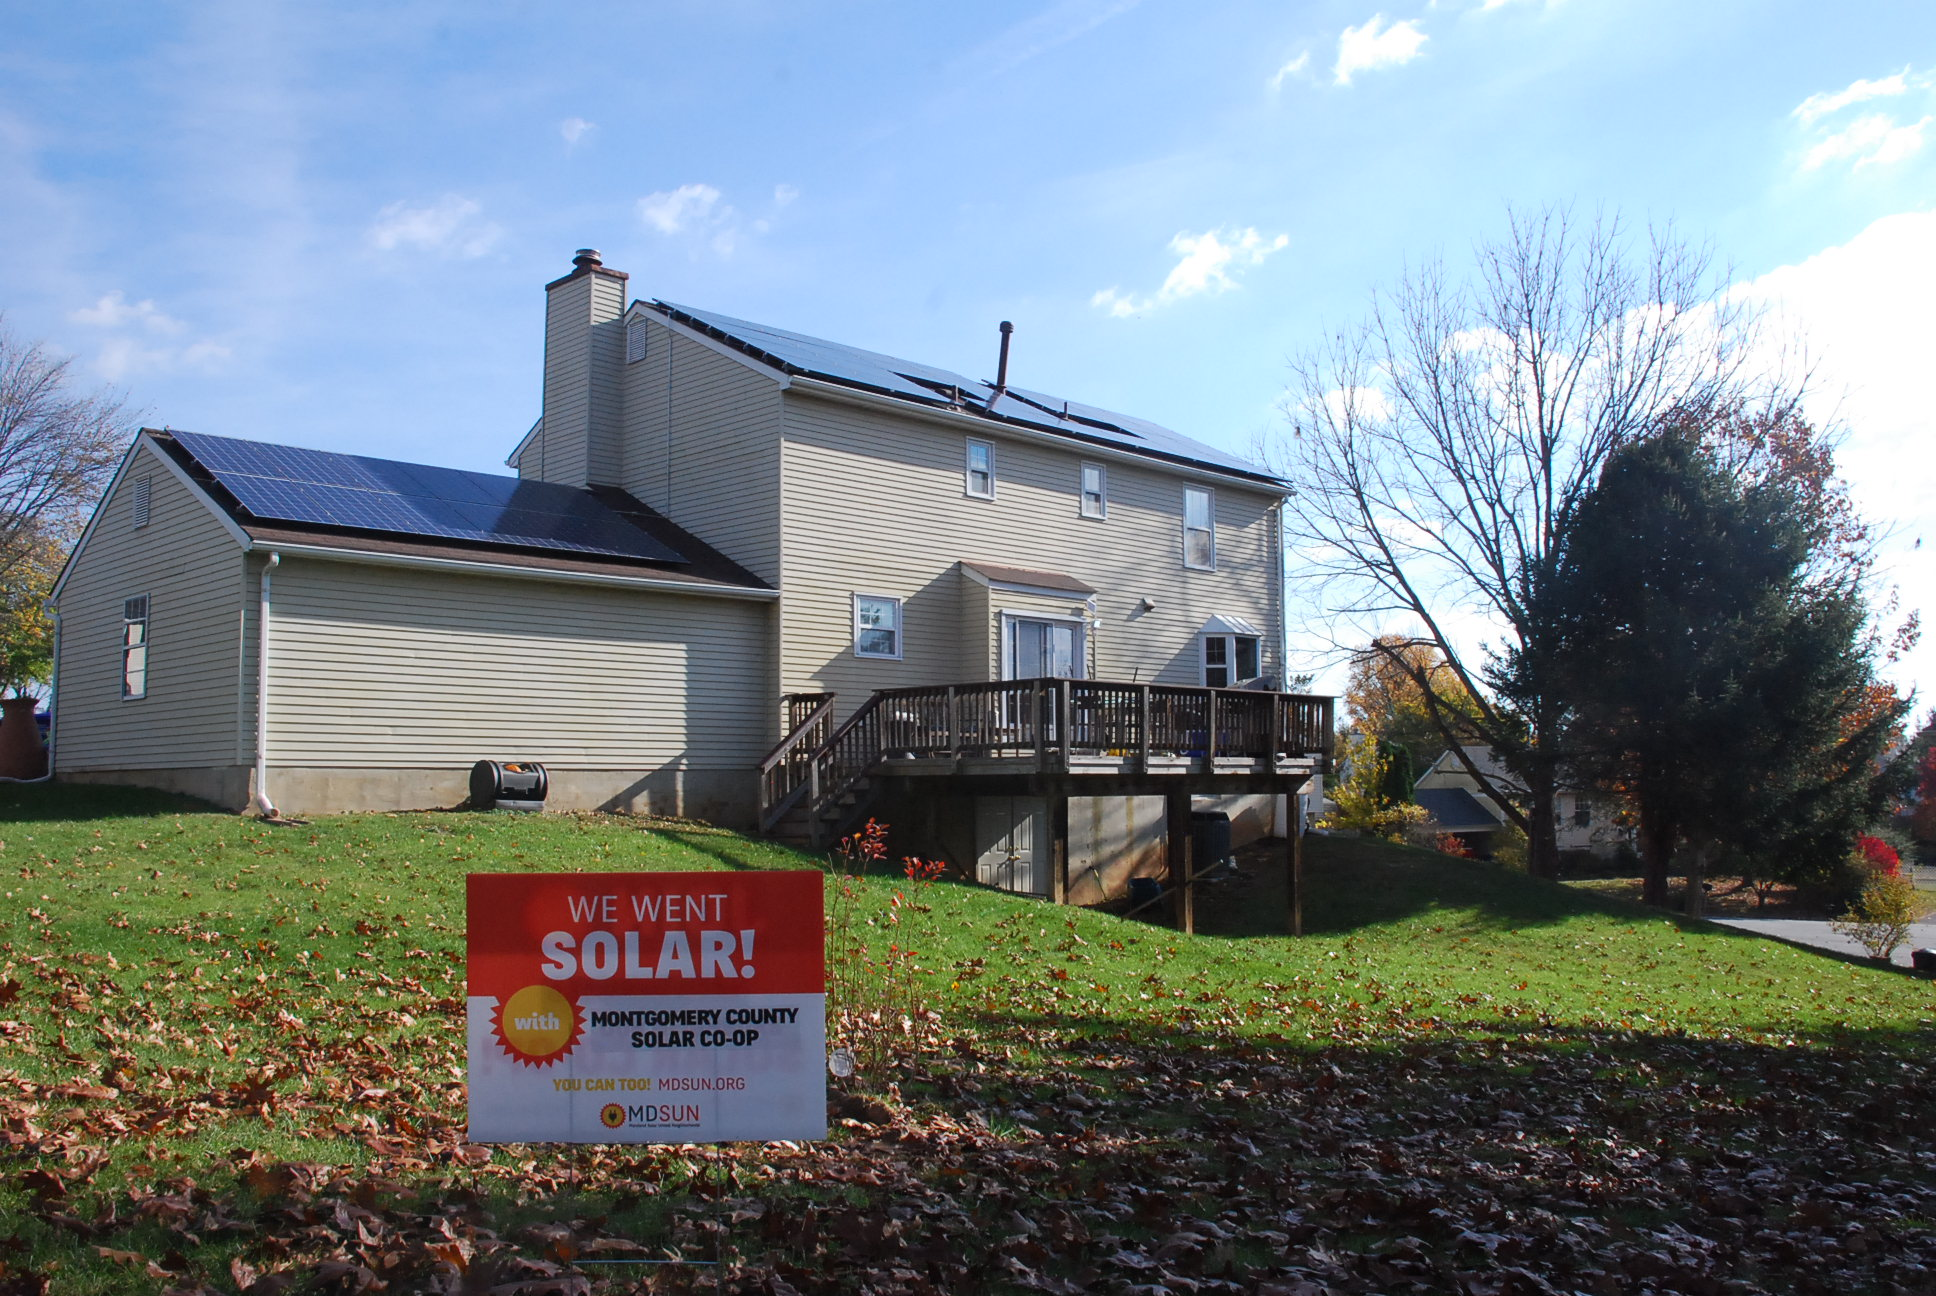 Tom Greenwell's solar isntallation